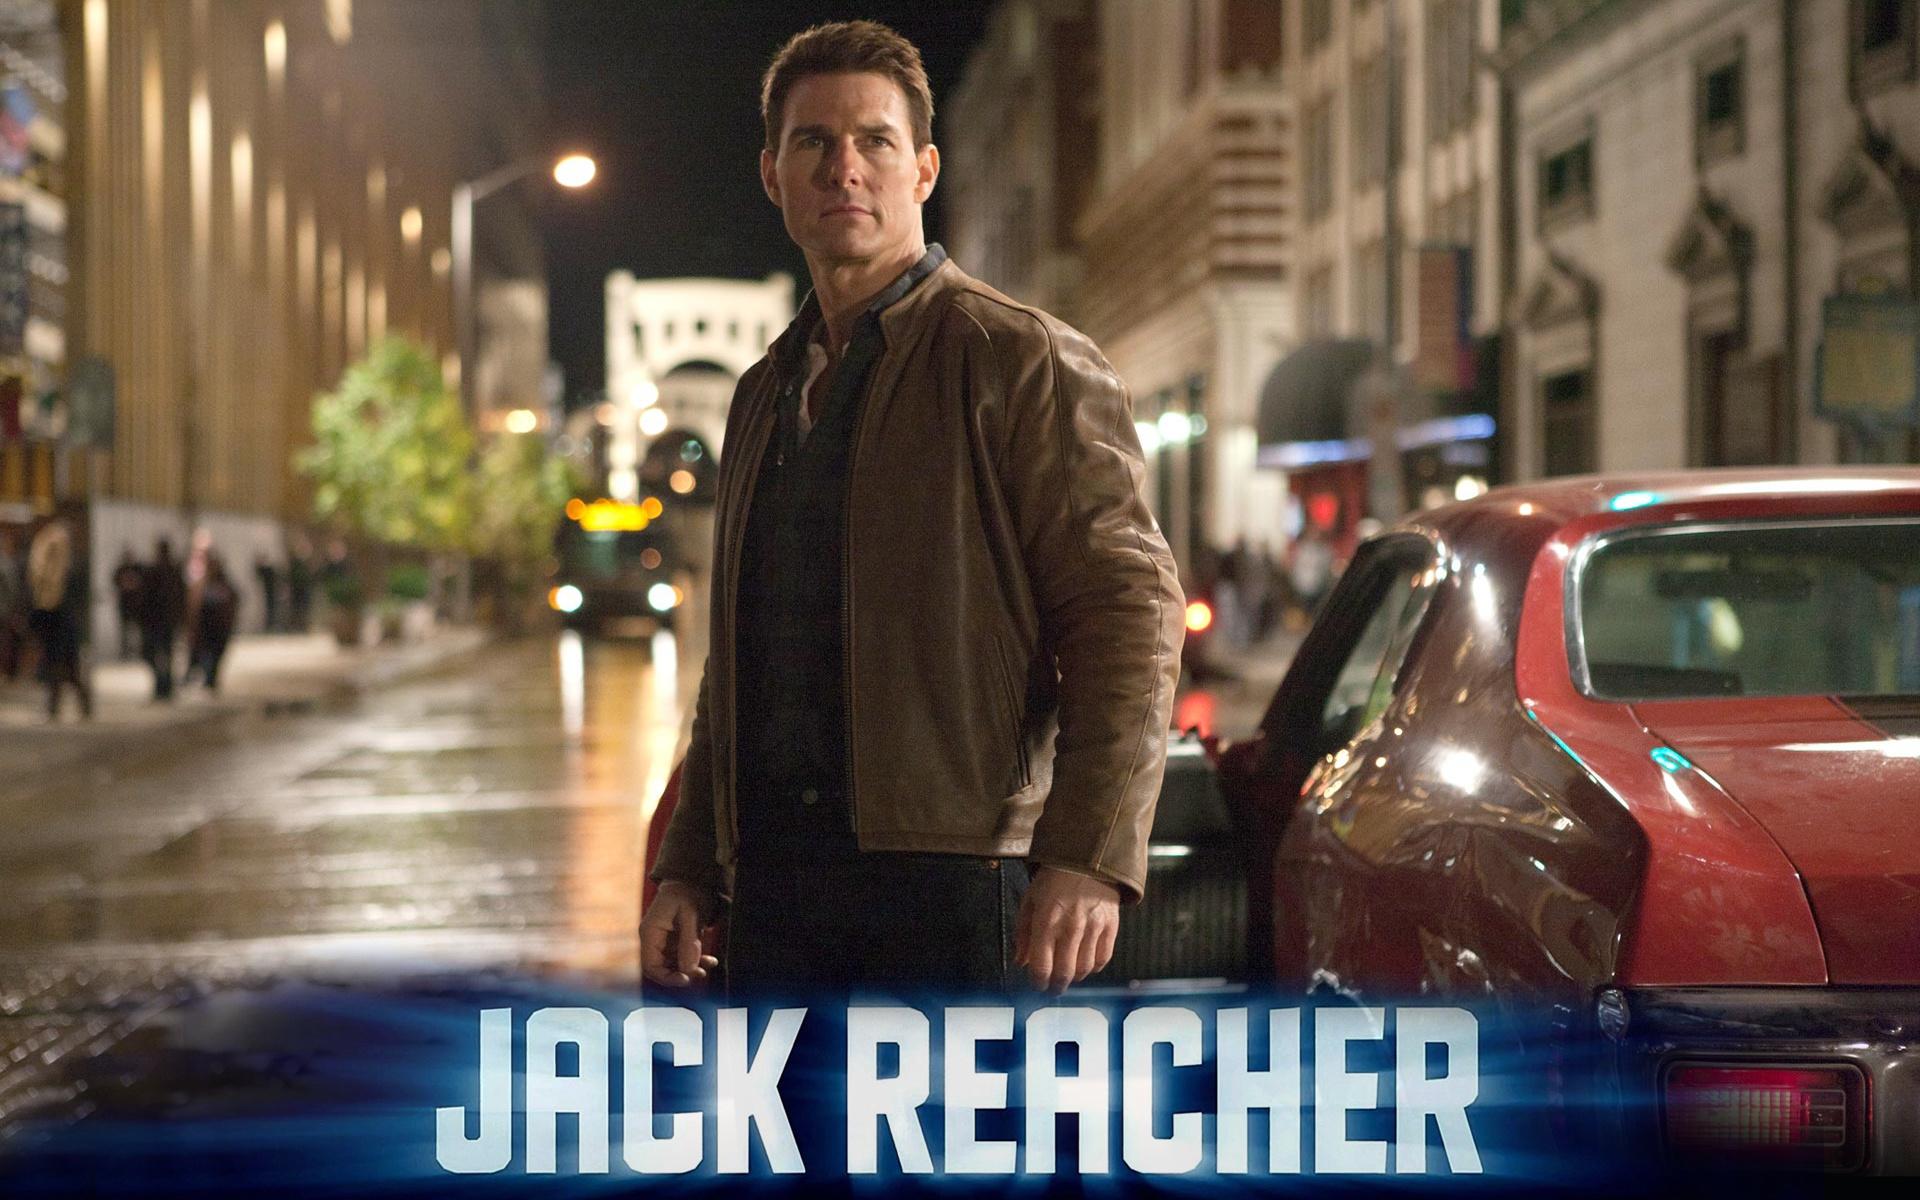 Wallpaper de Cine. Jack Reacher